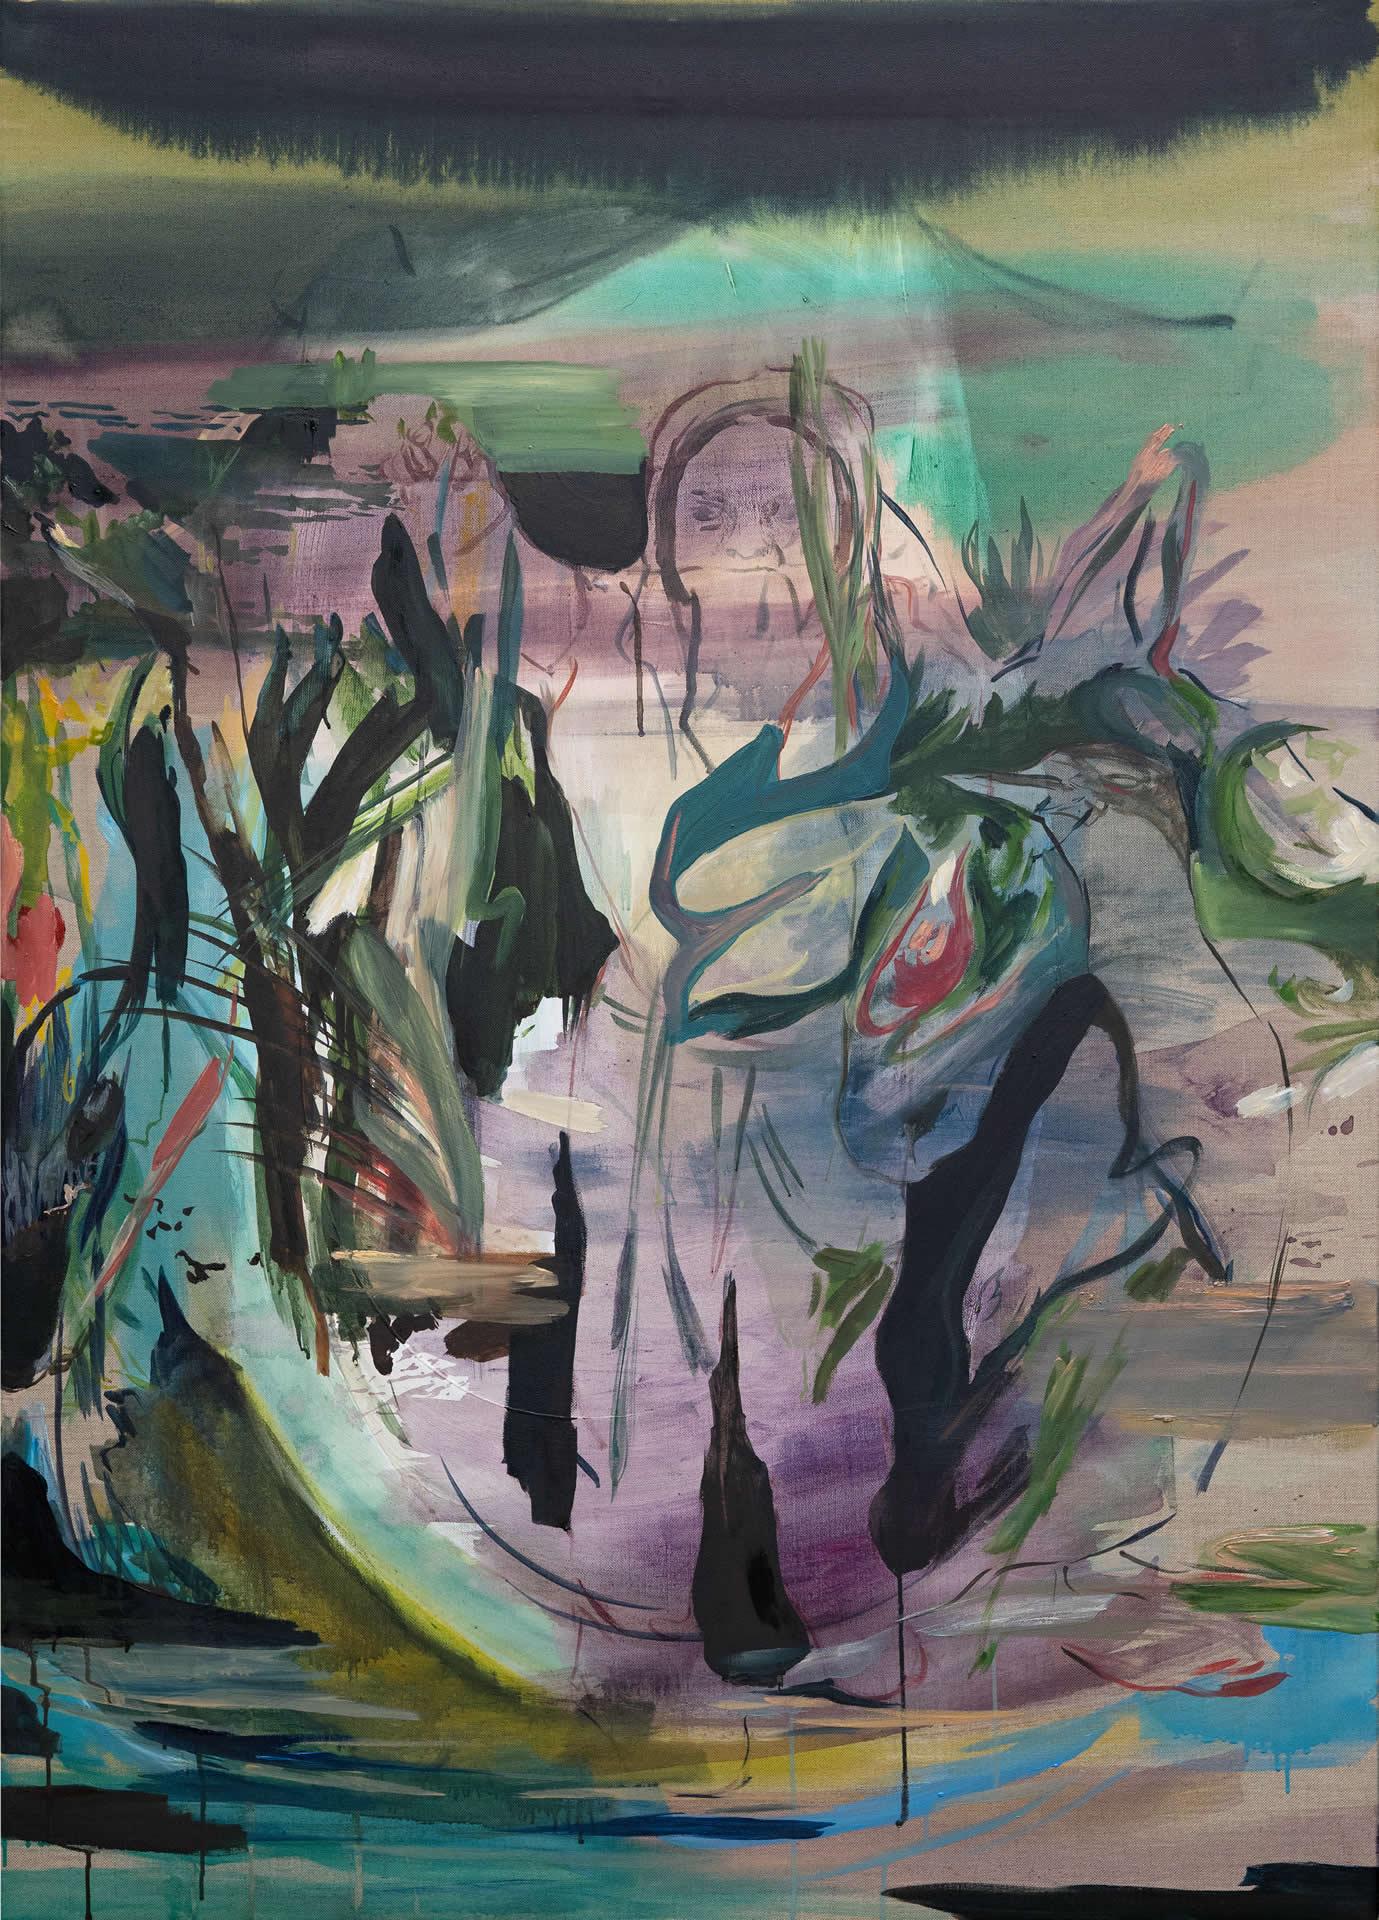 Elisabeth Wedenig | there is water between us | 140 x 100 cm | Foto Peter Schaflechner